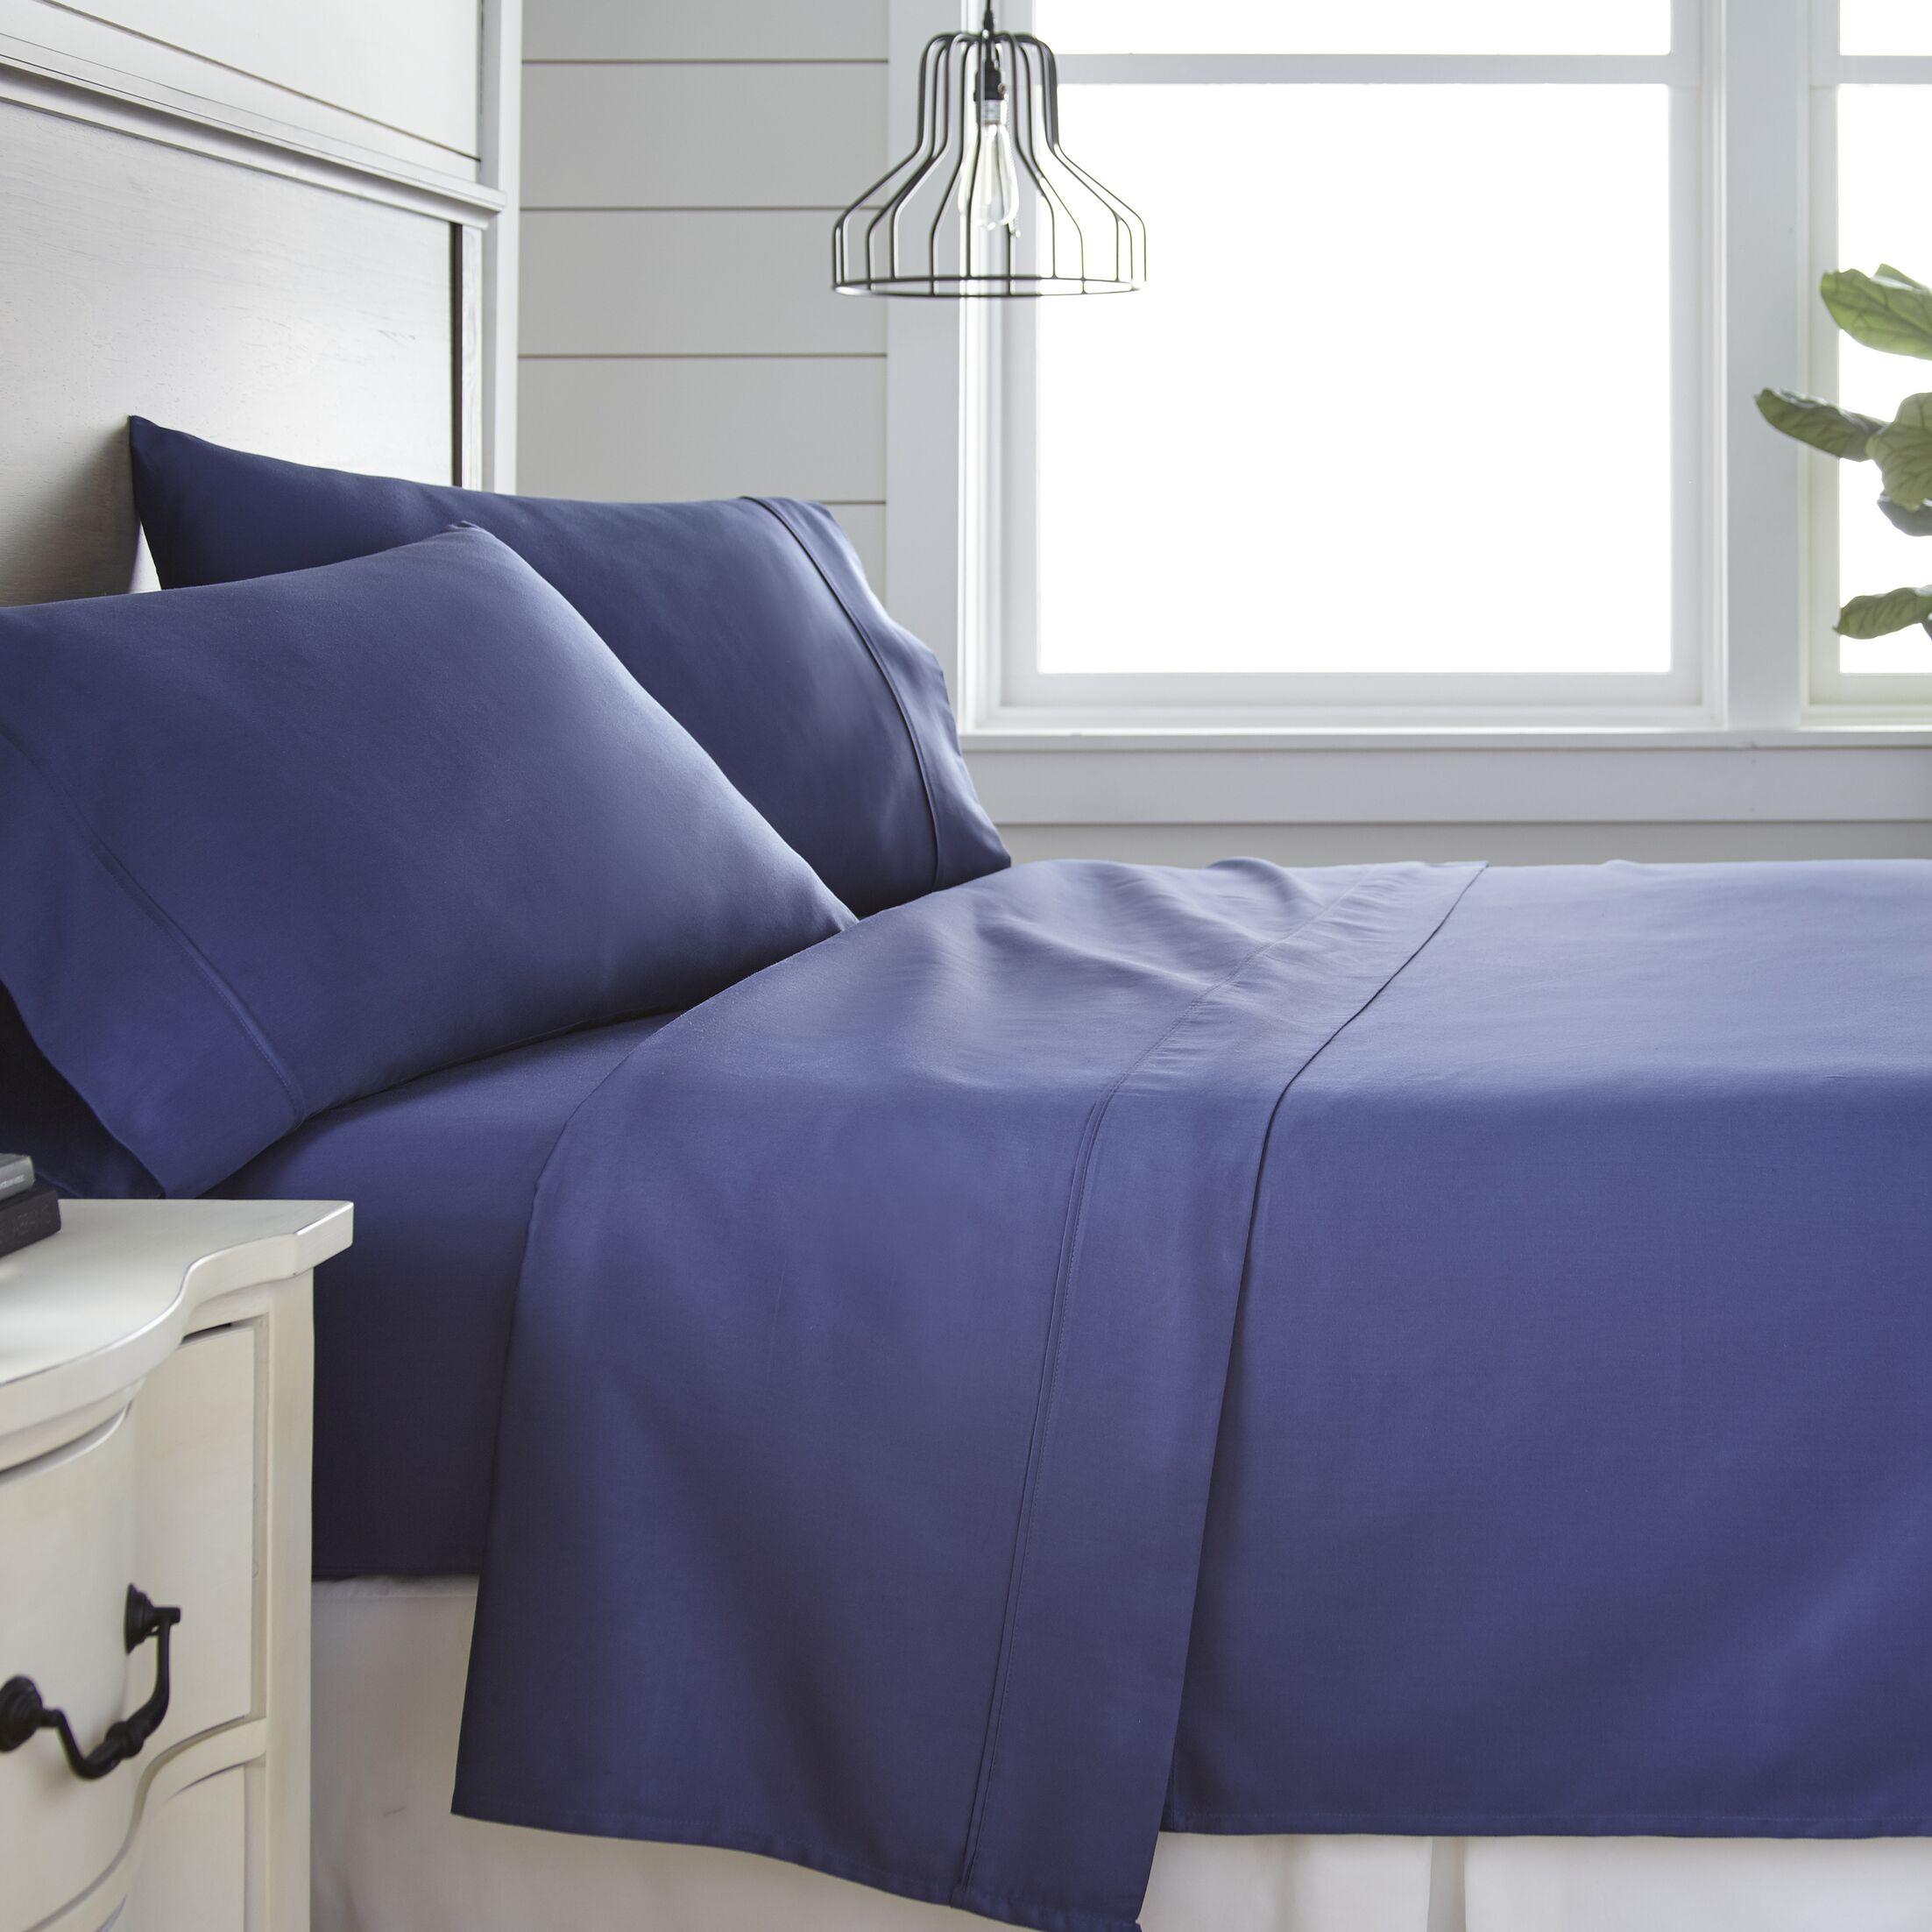 Long Ashton 300 Thread Count 100% Cotton Sheet Set Size: Twin, Color: Navy